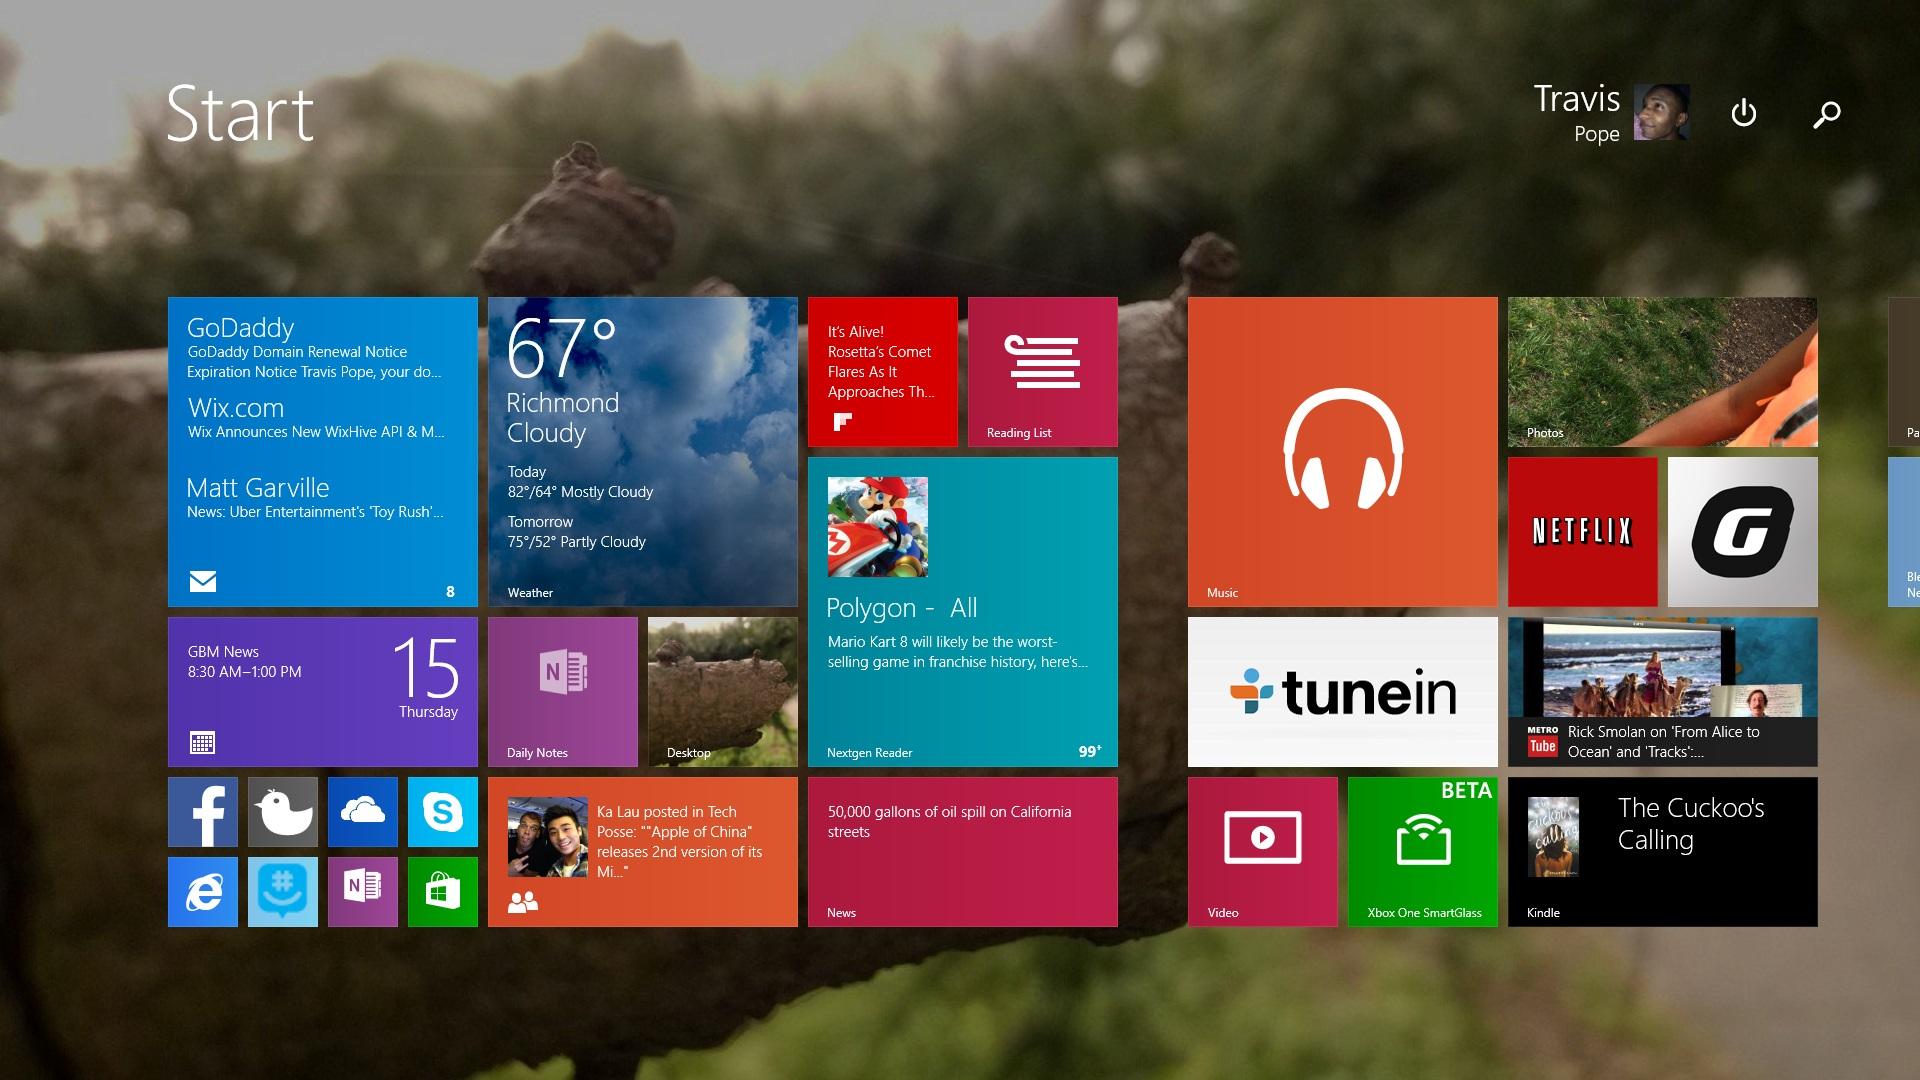 How to Customize the Windows 81 Lock Screen 1 1920x1080